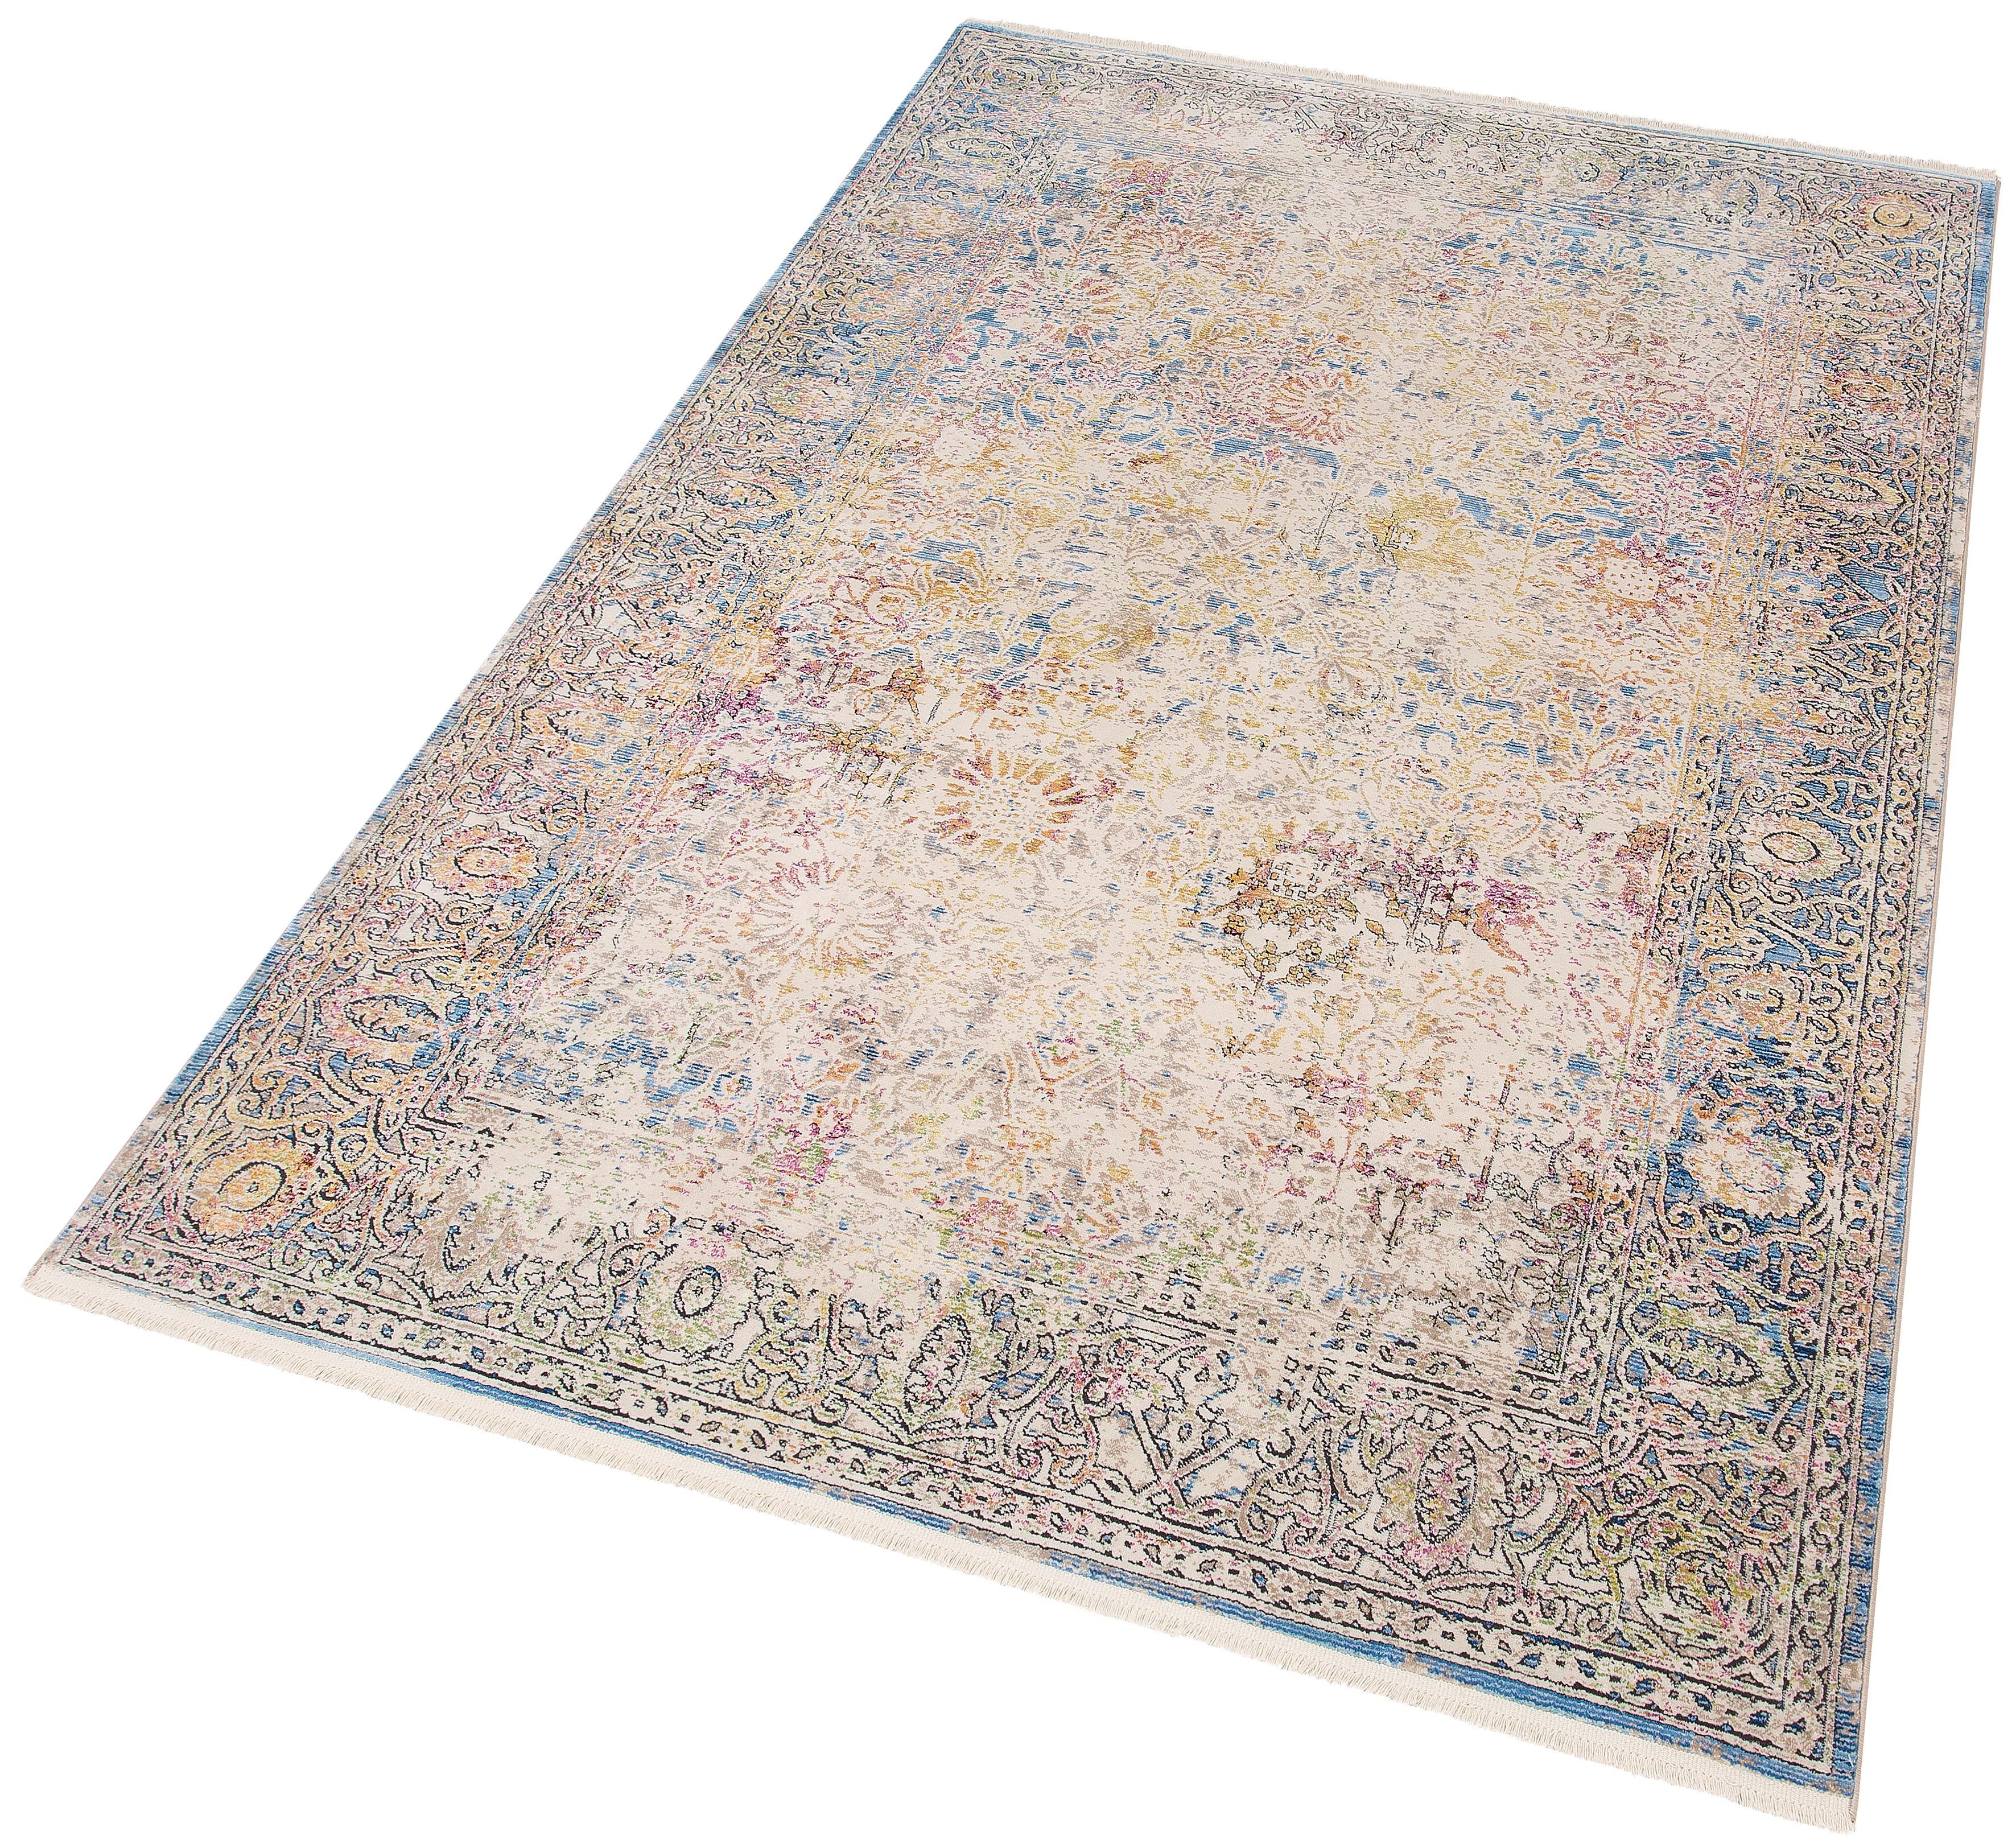 Teppich Colorful 24030 merinos rechteckig Höhe 7 mm maschinell gewebt